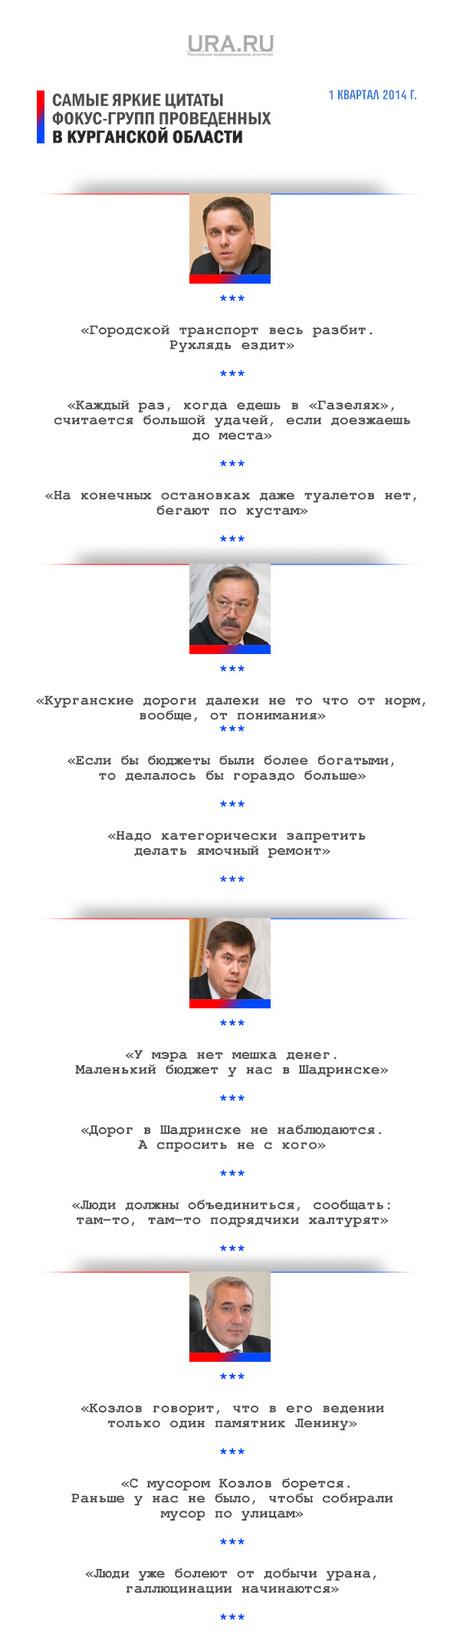 Главу Нижневартовска Максима